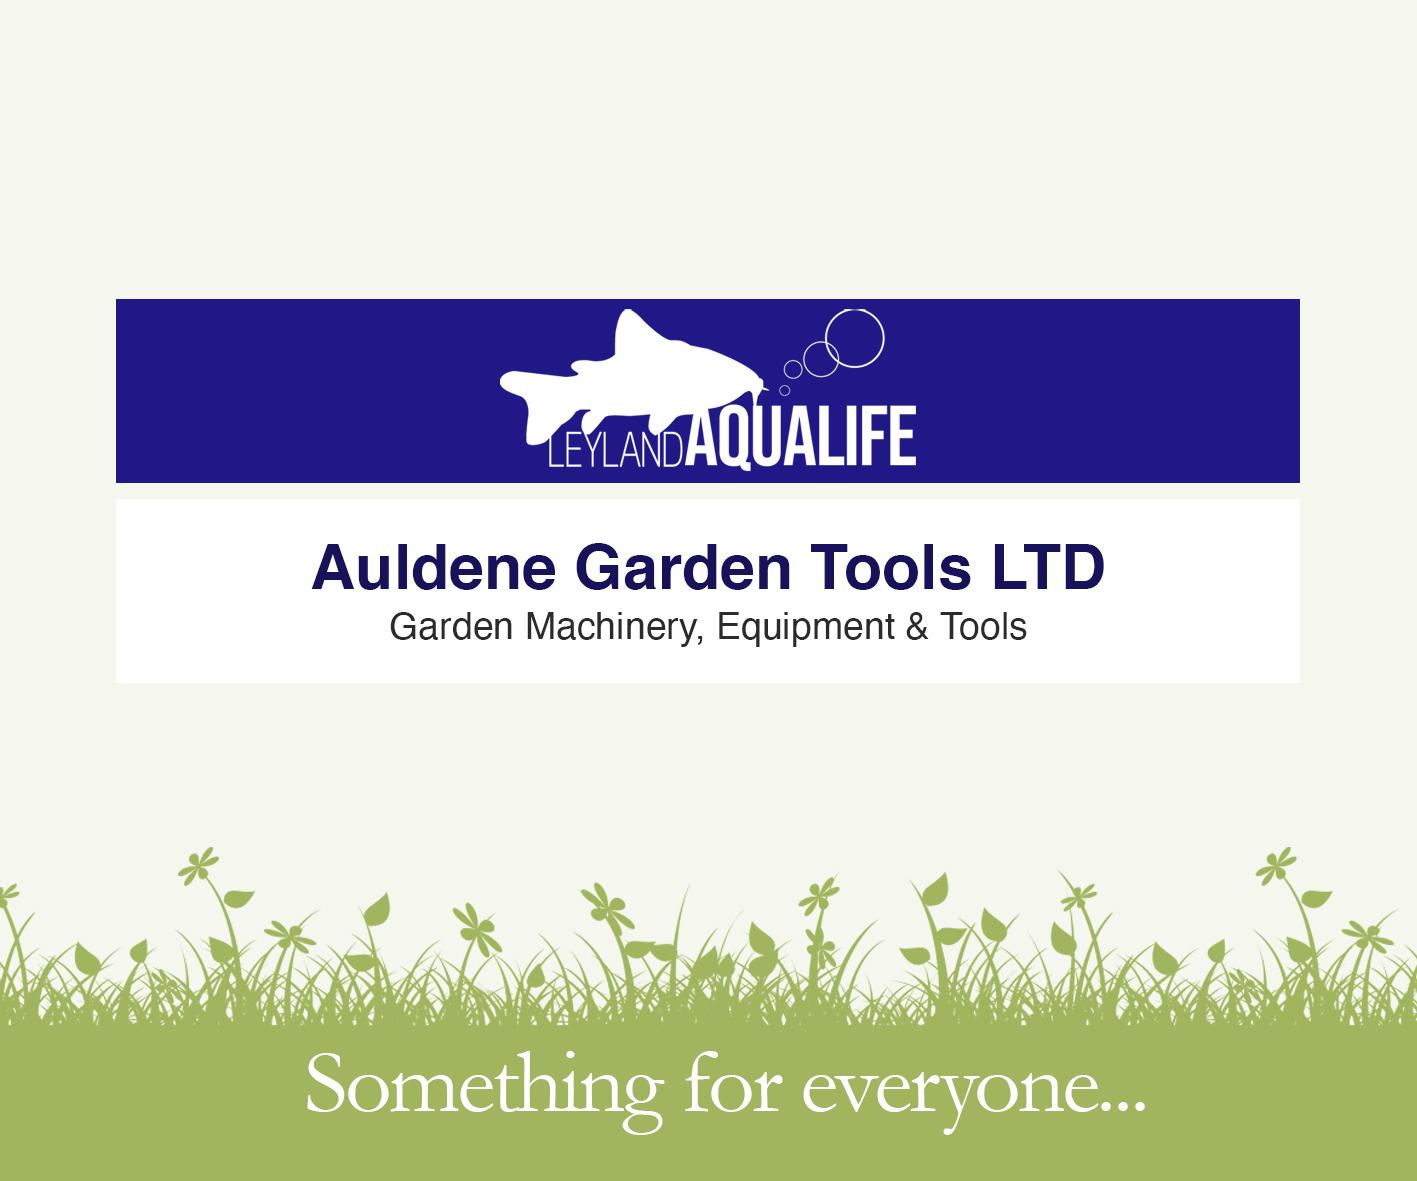 Leyland Concessions - Aqualife, Auldene Garden Tools LTD